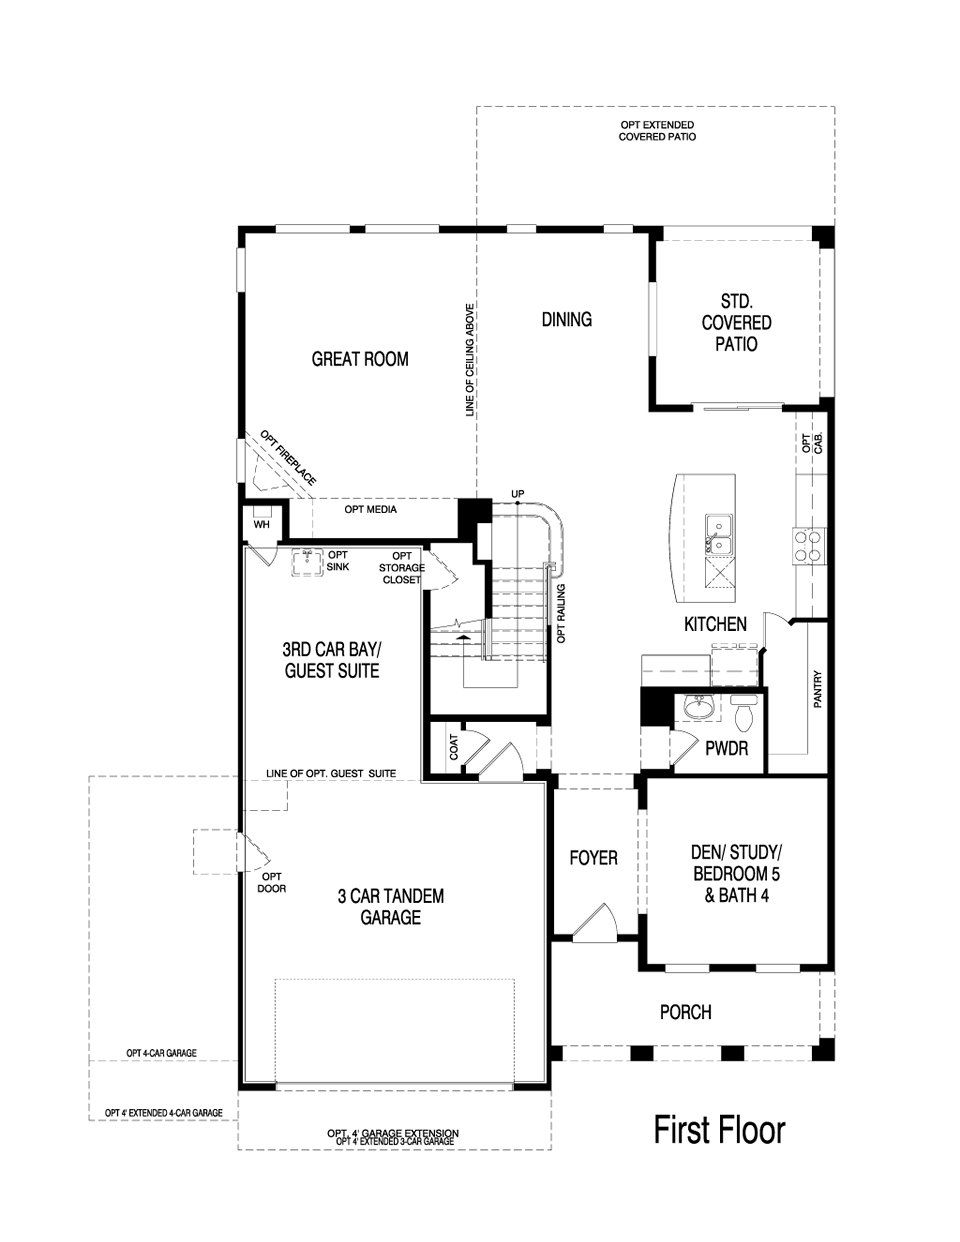 Pulte homes topaz floor plan via for Hangar home floor plans